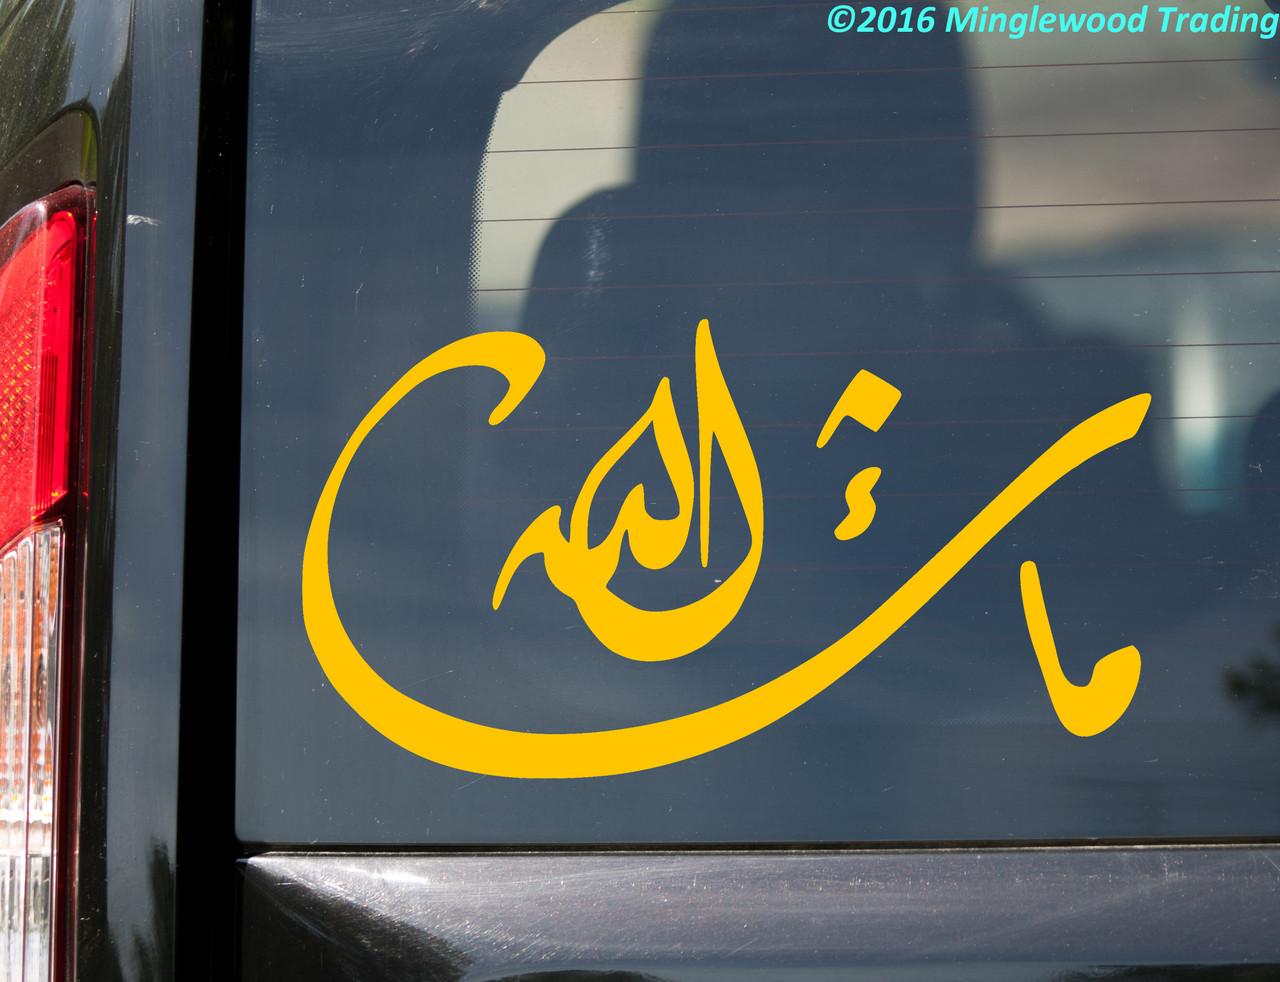 Mashallah Vinyl Decal - Arabic Joy Praise God willed it Allah - Die Cut Sticker